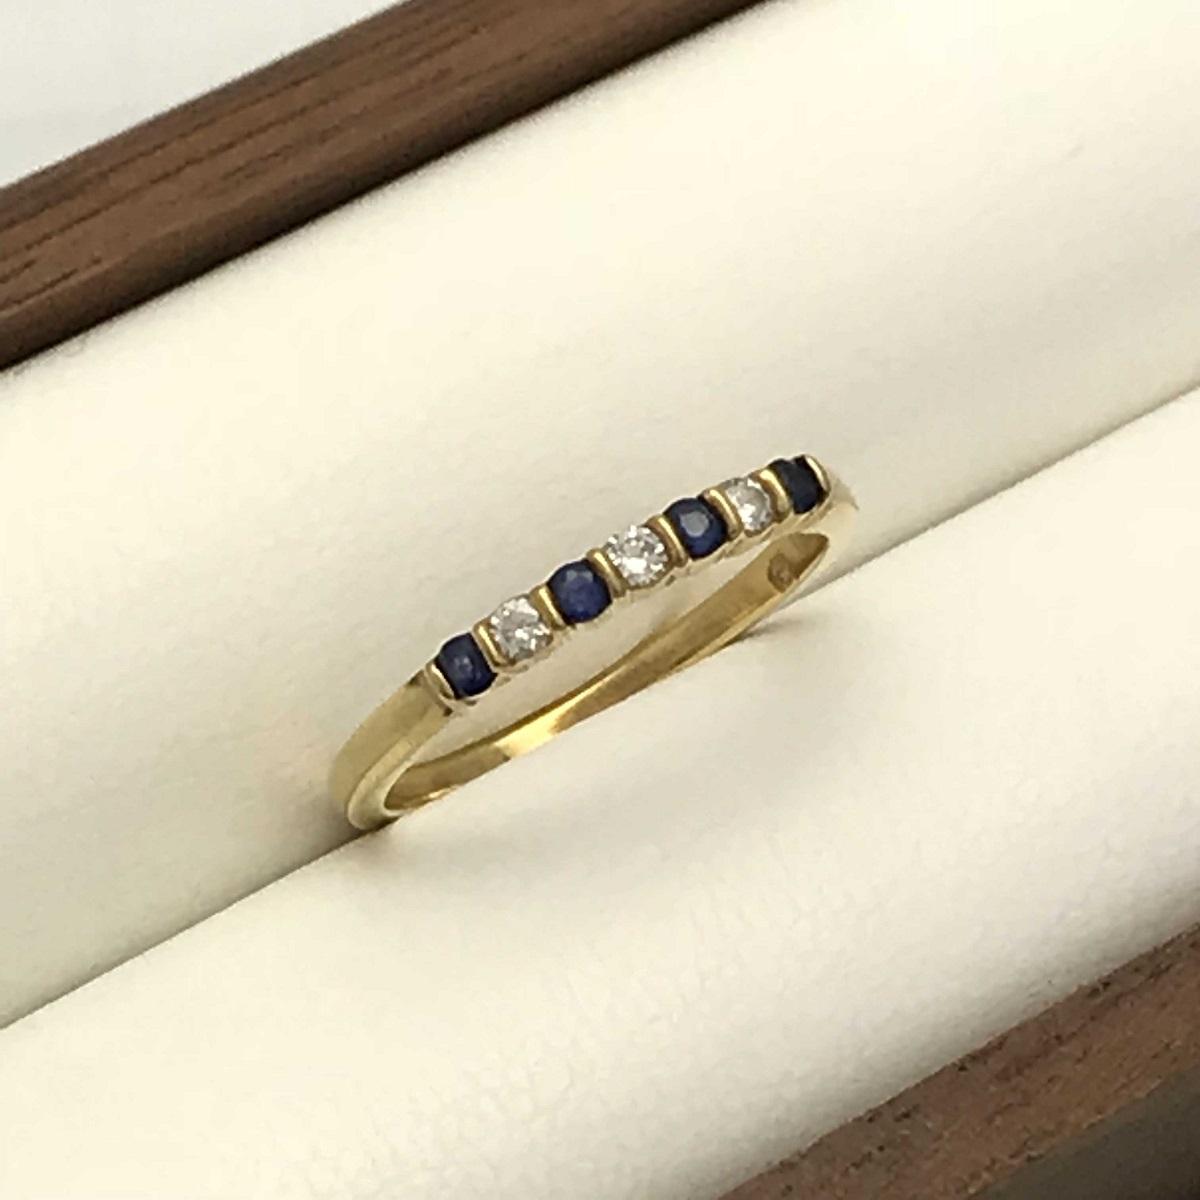 Tiffany & Co. ティファニー ダイヤ×サファイアリング 指輪 #10 750YG 【トレジャースポット】【中古】